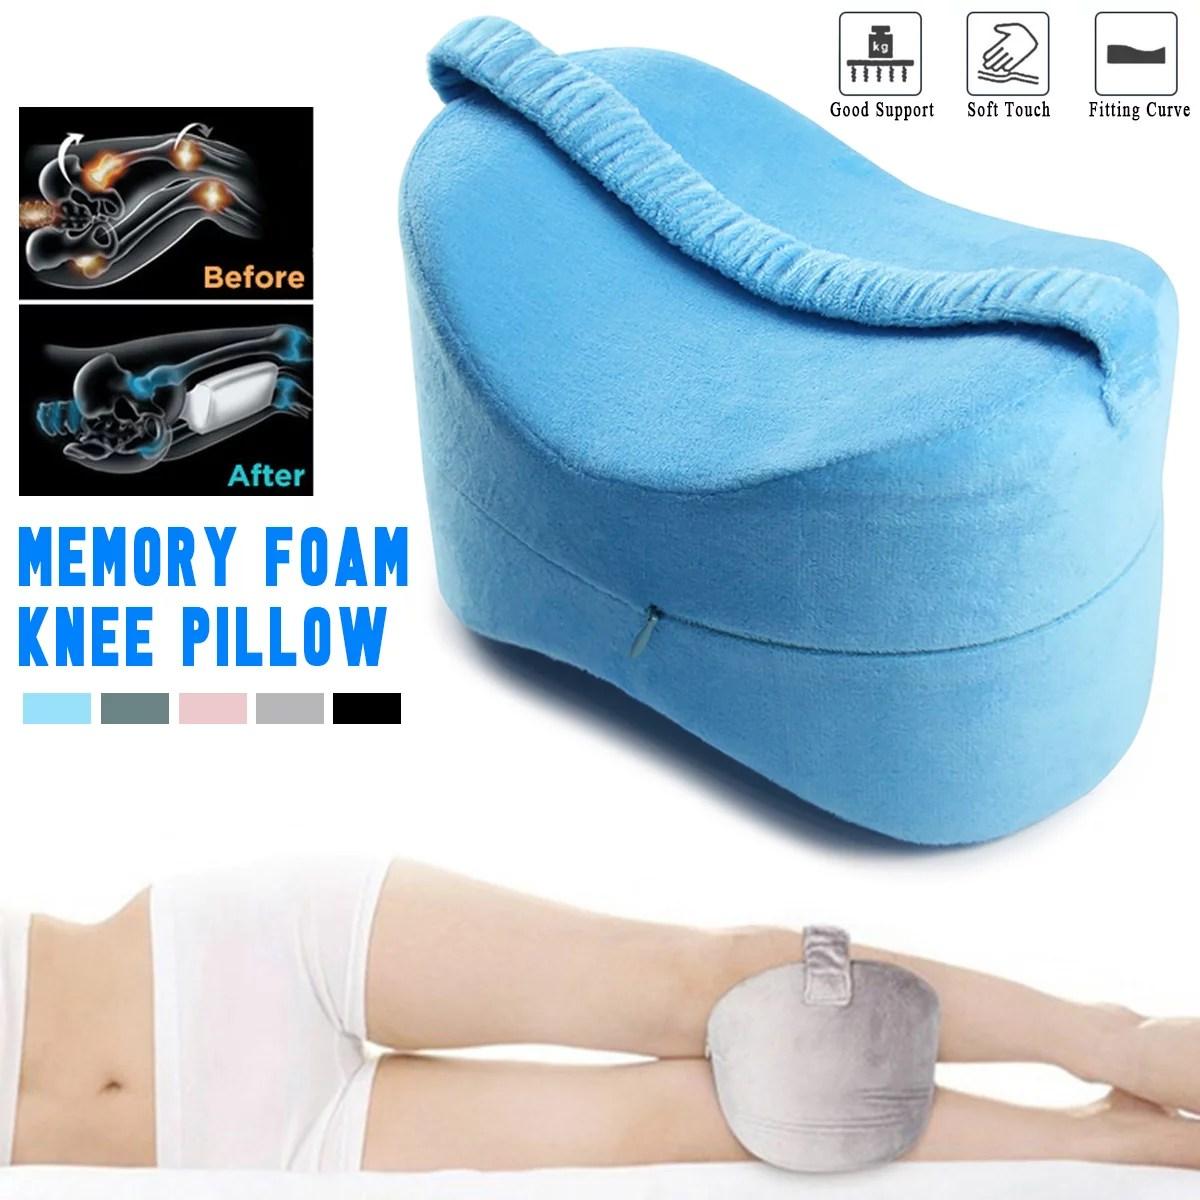 memory foam knee pillow leg pillow cushions side sleeper body pillows travel under knee sleeping gear sciatica pain relief back support